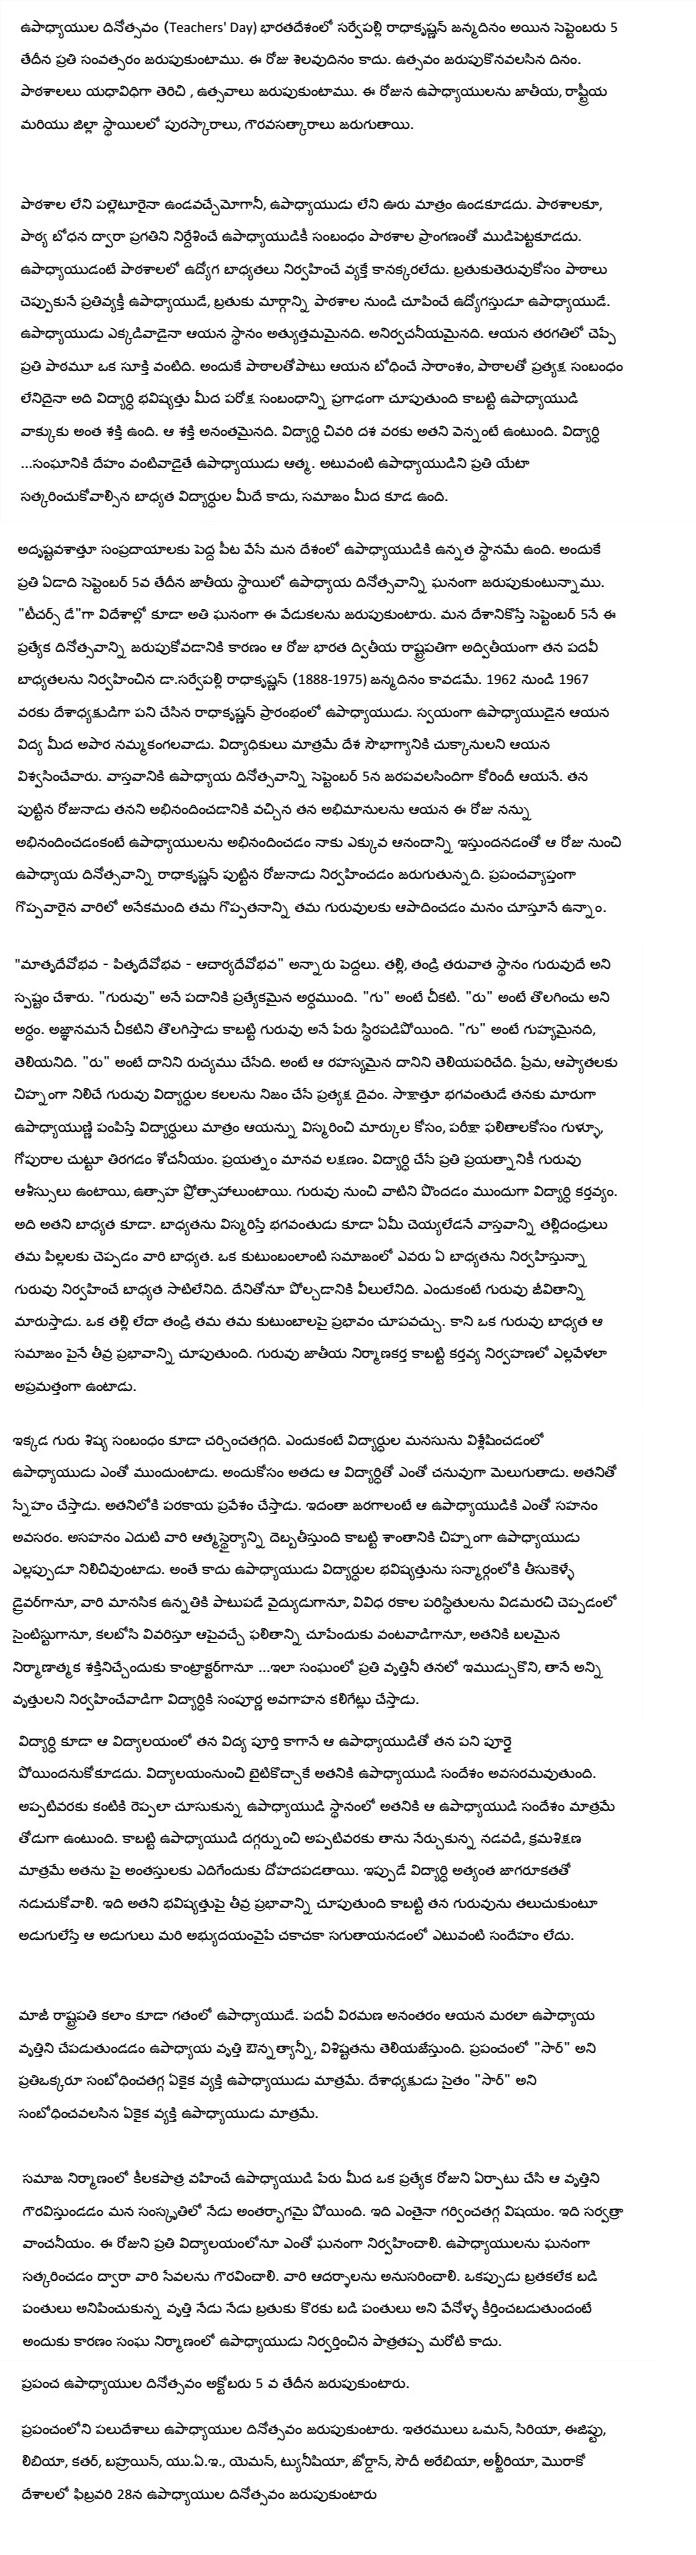 004 Environmental Protection Essay Stupendous In Tamil English Pdf Hindi Full